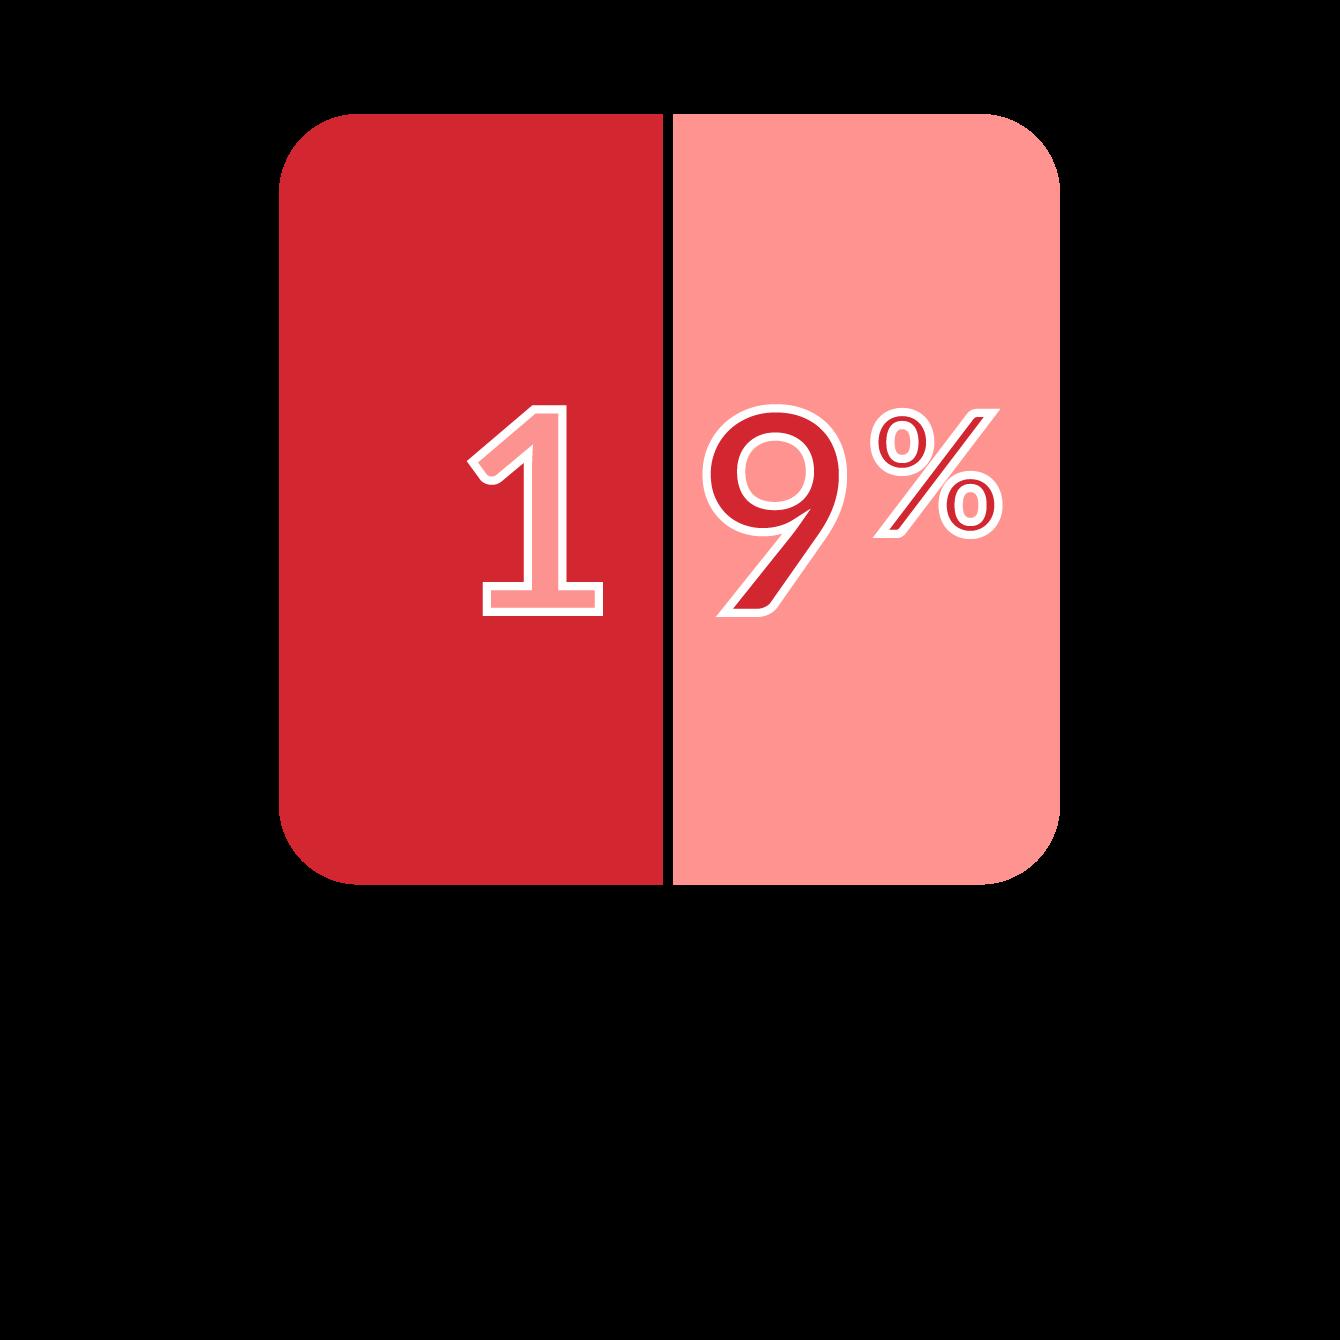 19% improvement in contrast sensitivity